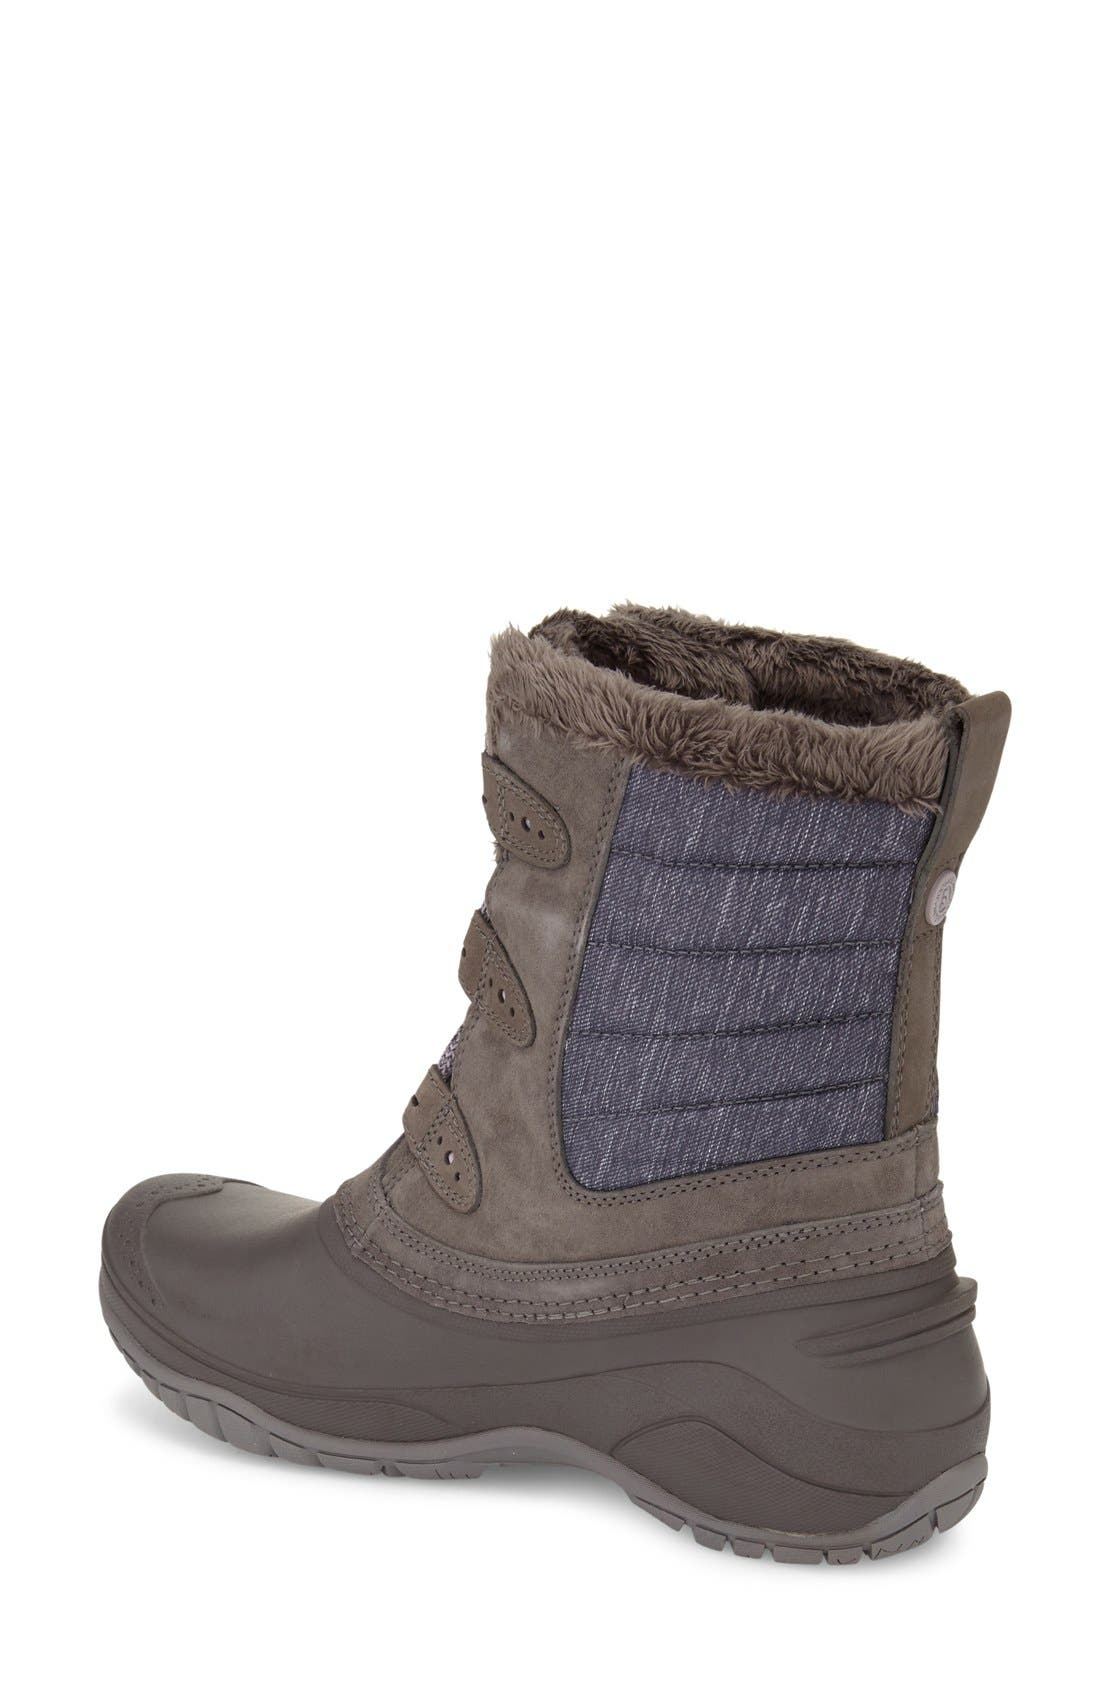 Shellista II Waterproof Boot,                             Alternate thumbnail 35, color,